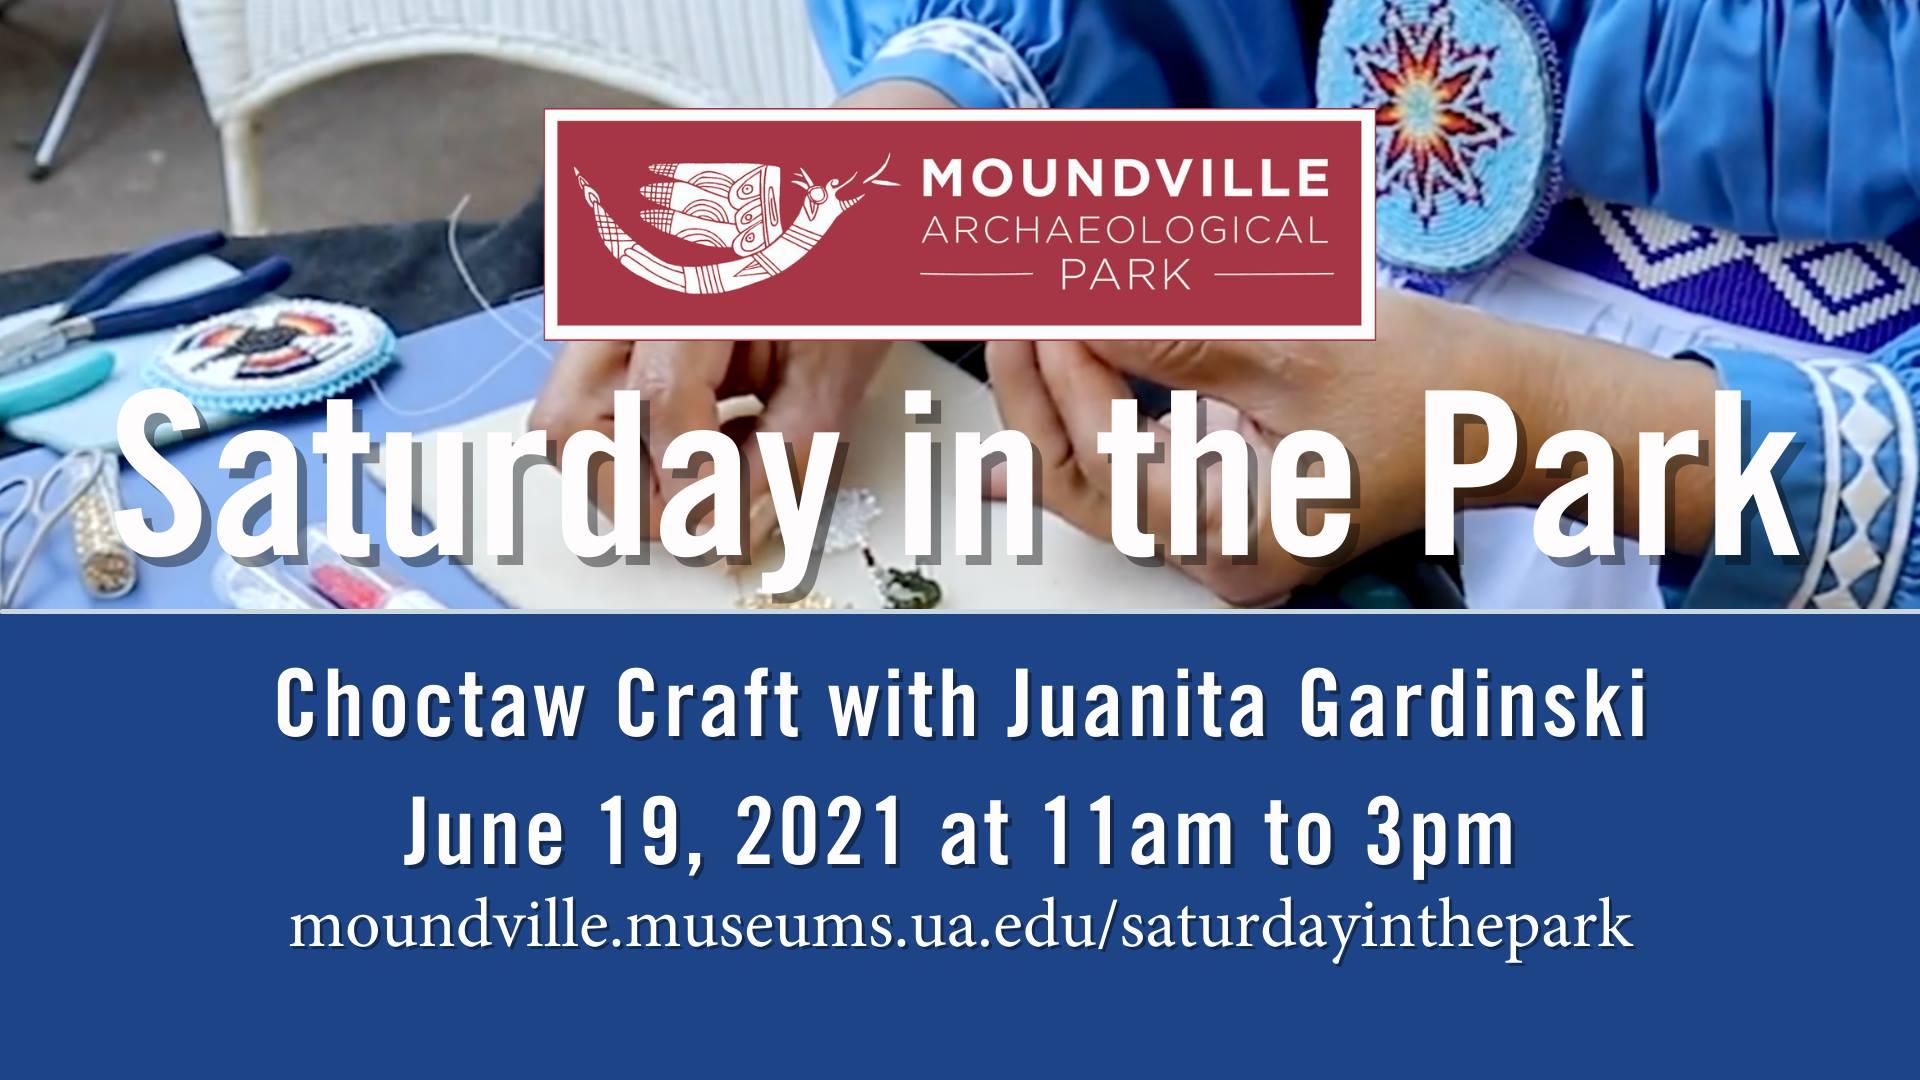 Saturday in the Park: Choctaw Craft with Juanita Gardinski